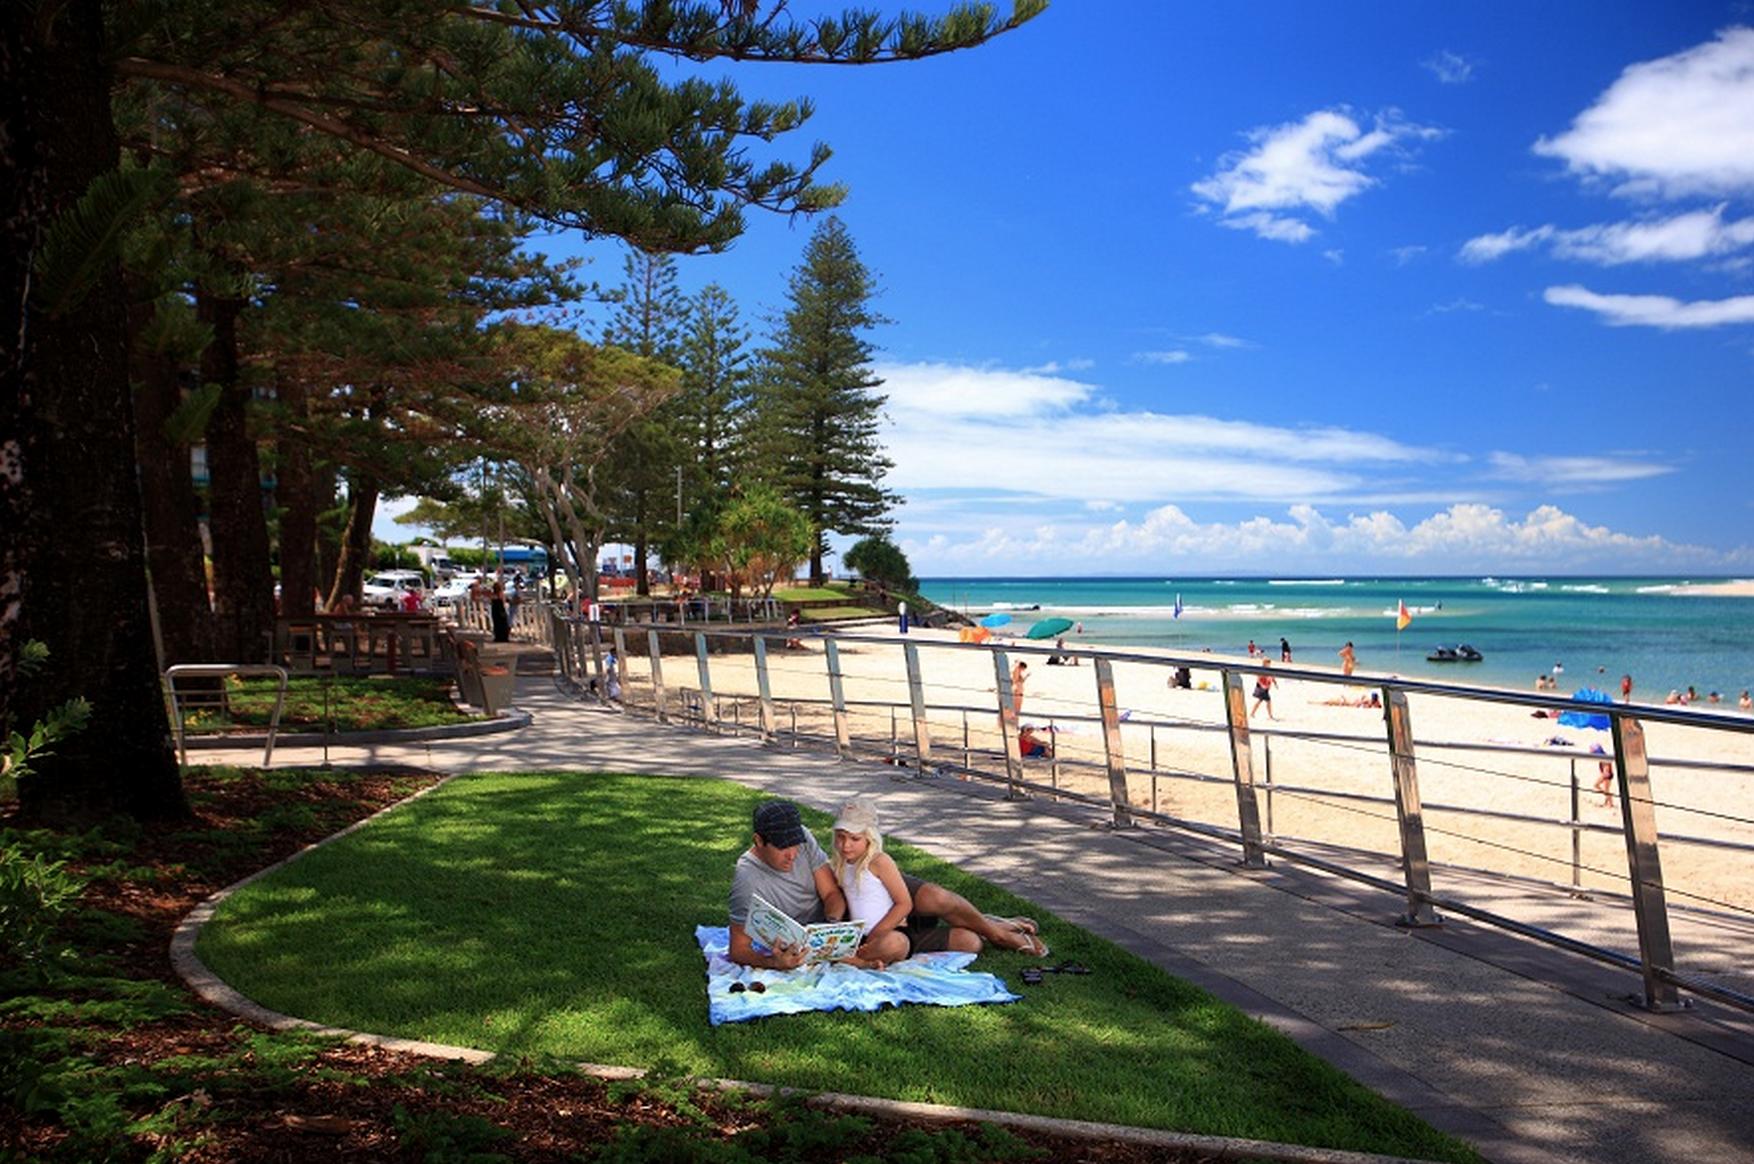 A small piece of Bulcock Beach that might need some Caloundra mowing? (Image credit: VisitSunshineCoast.com.au)